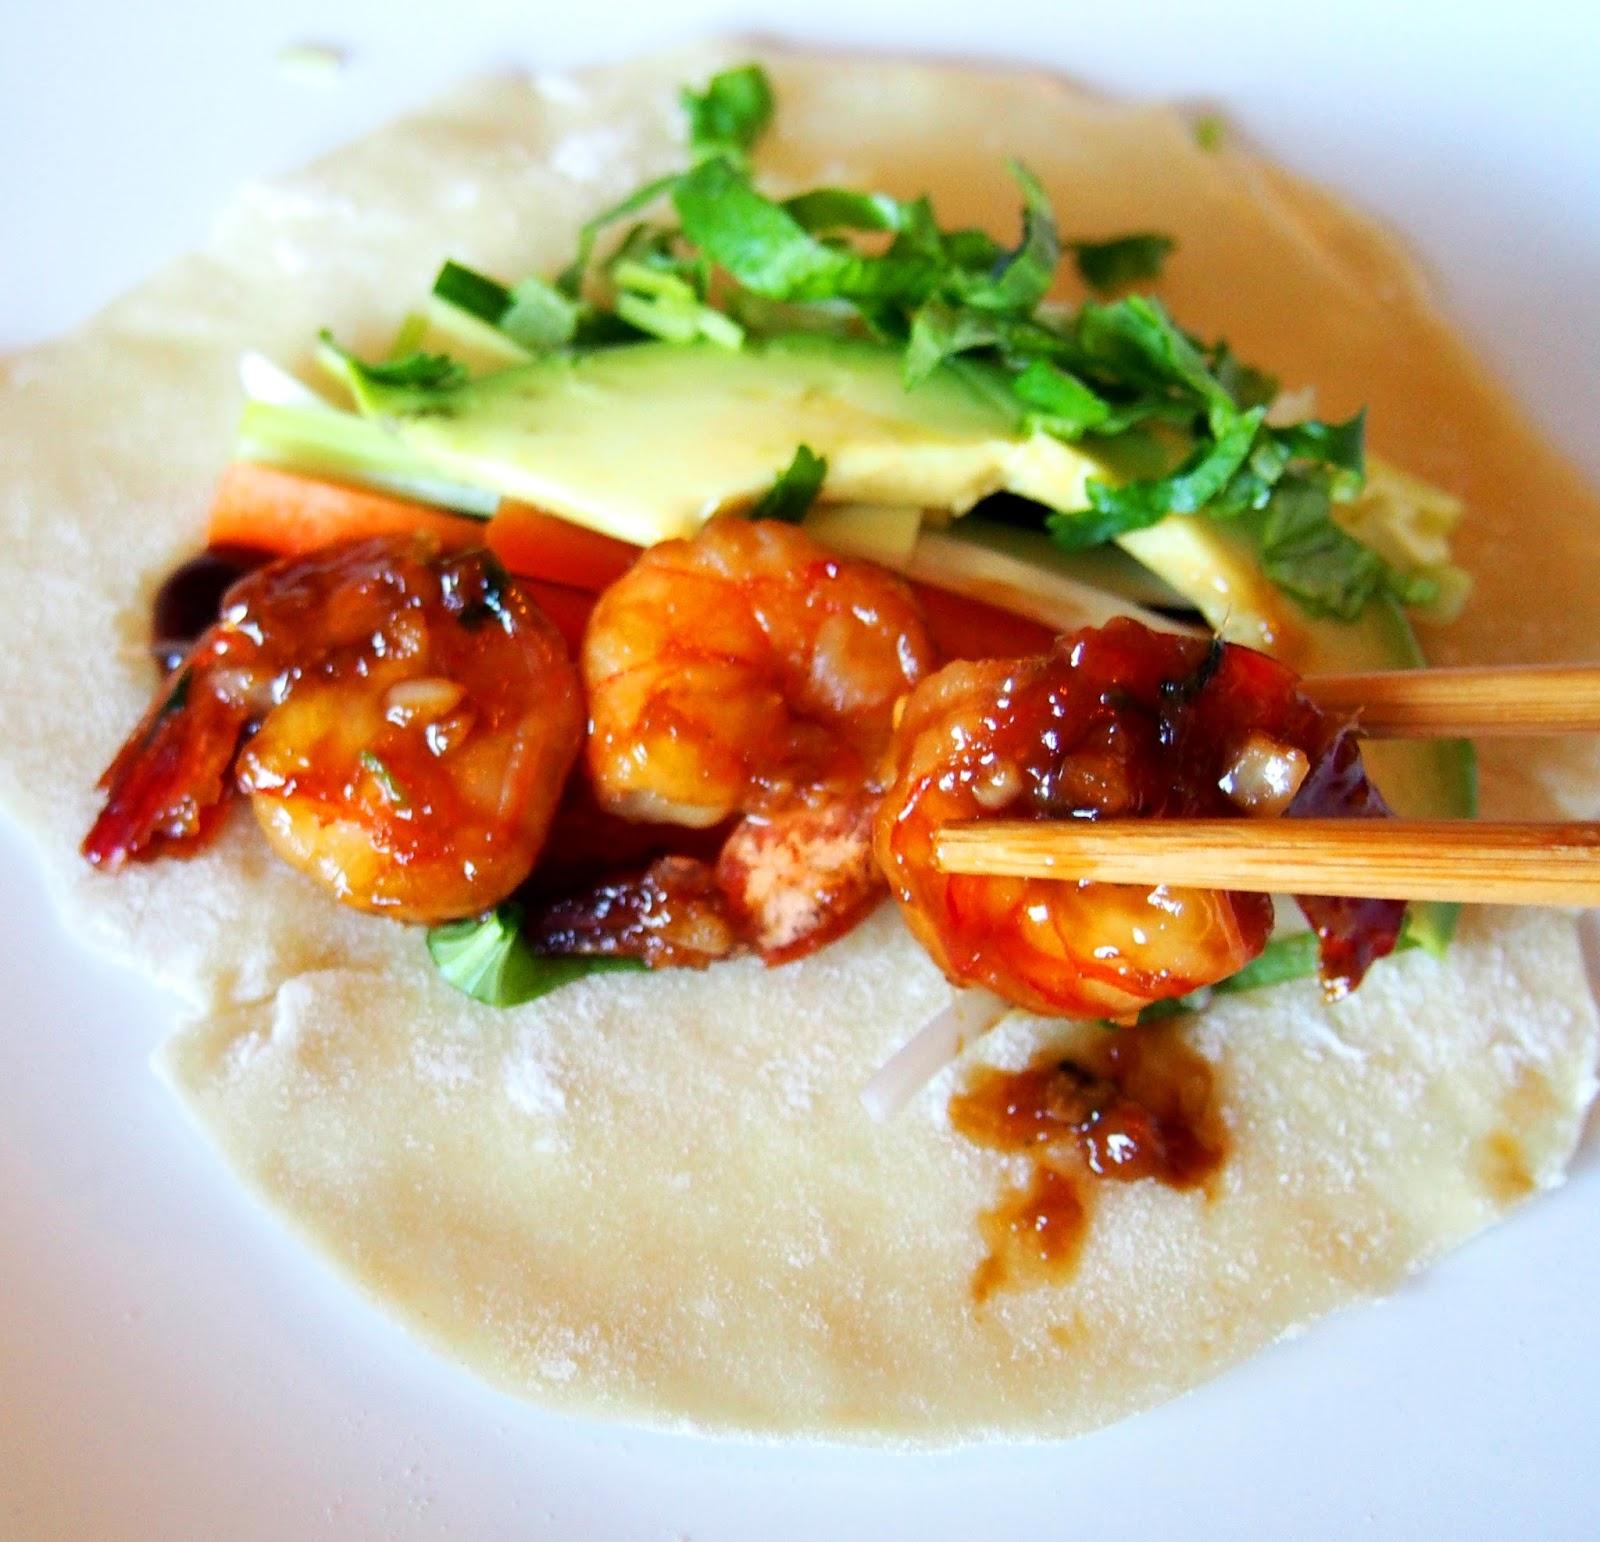 #asian #shrimp #seafood #fish #sea #food #chinese #soy #sauce #crepe #avocado #roll